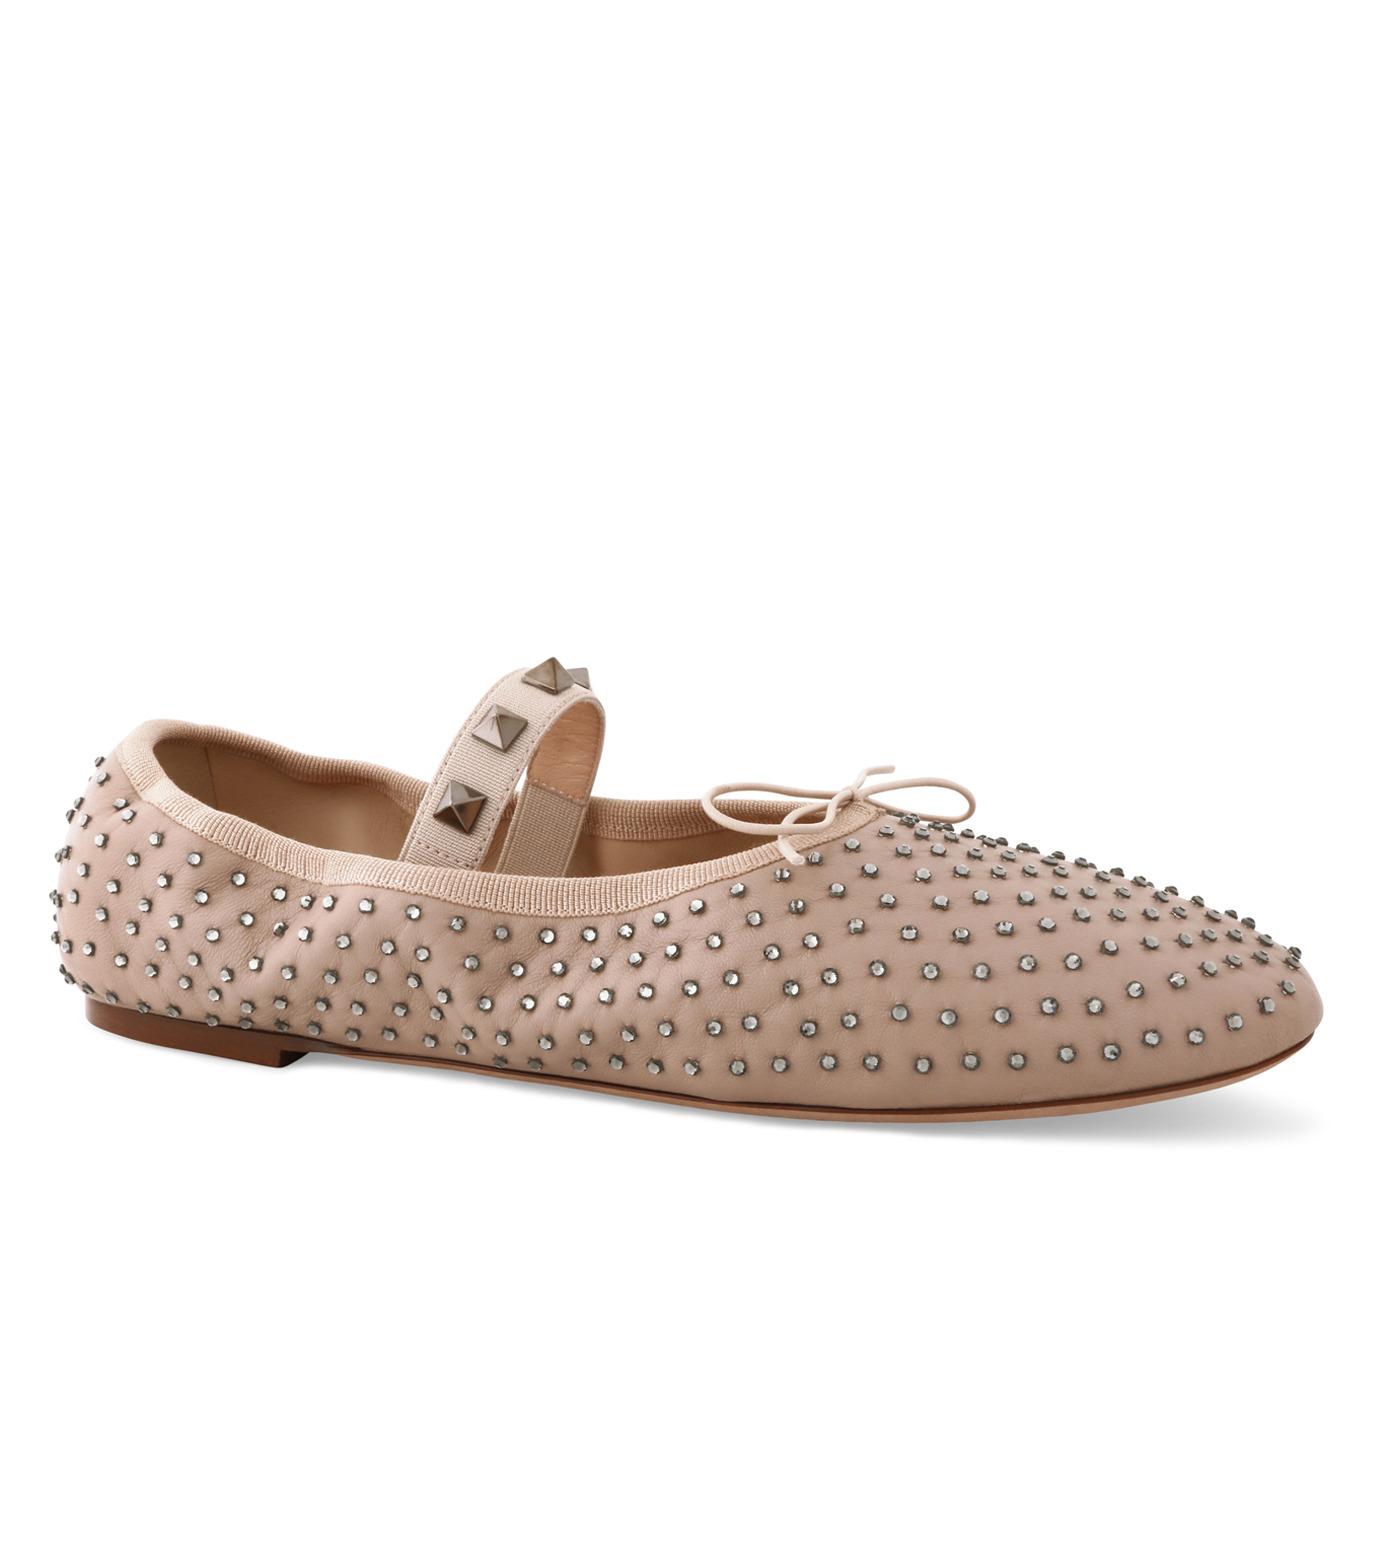 VALENTINO GARAVANI(ヴァレンティノ ガラヴァーニ)のBallerina Flat Strass-BEIGE(フラットシューズ/Flat shoes)-LW0S0A93FNR-52 拡大詳細画像1